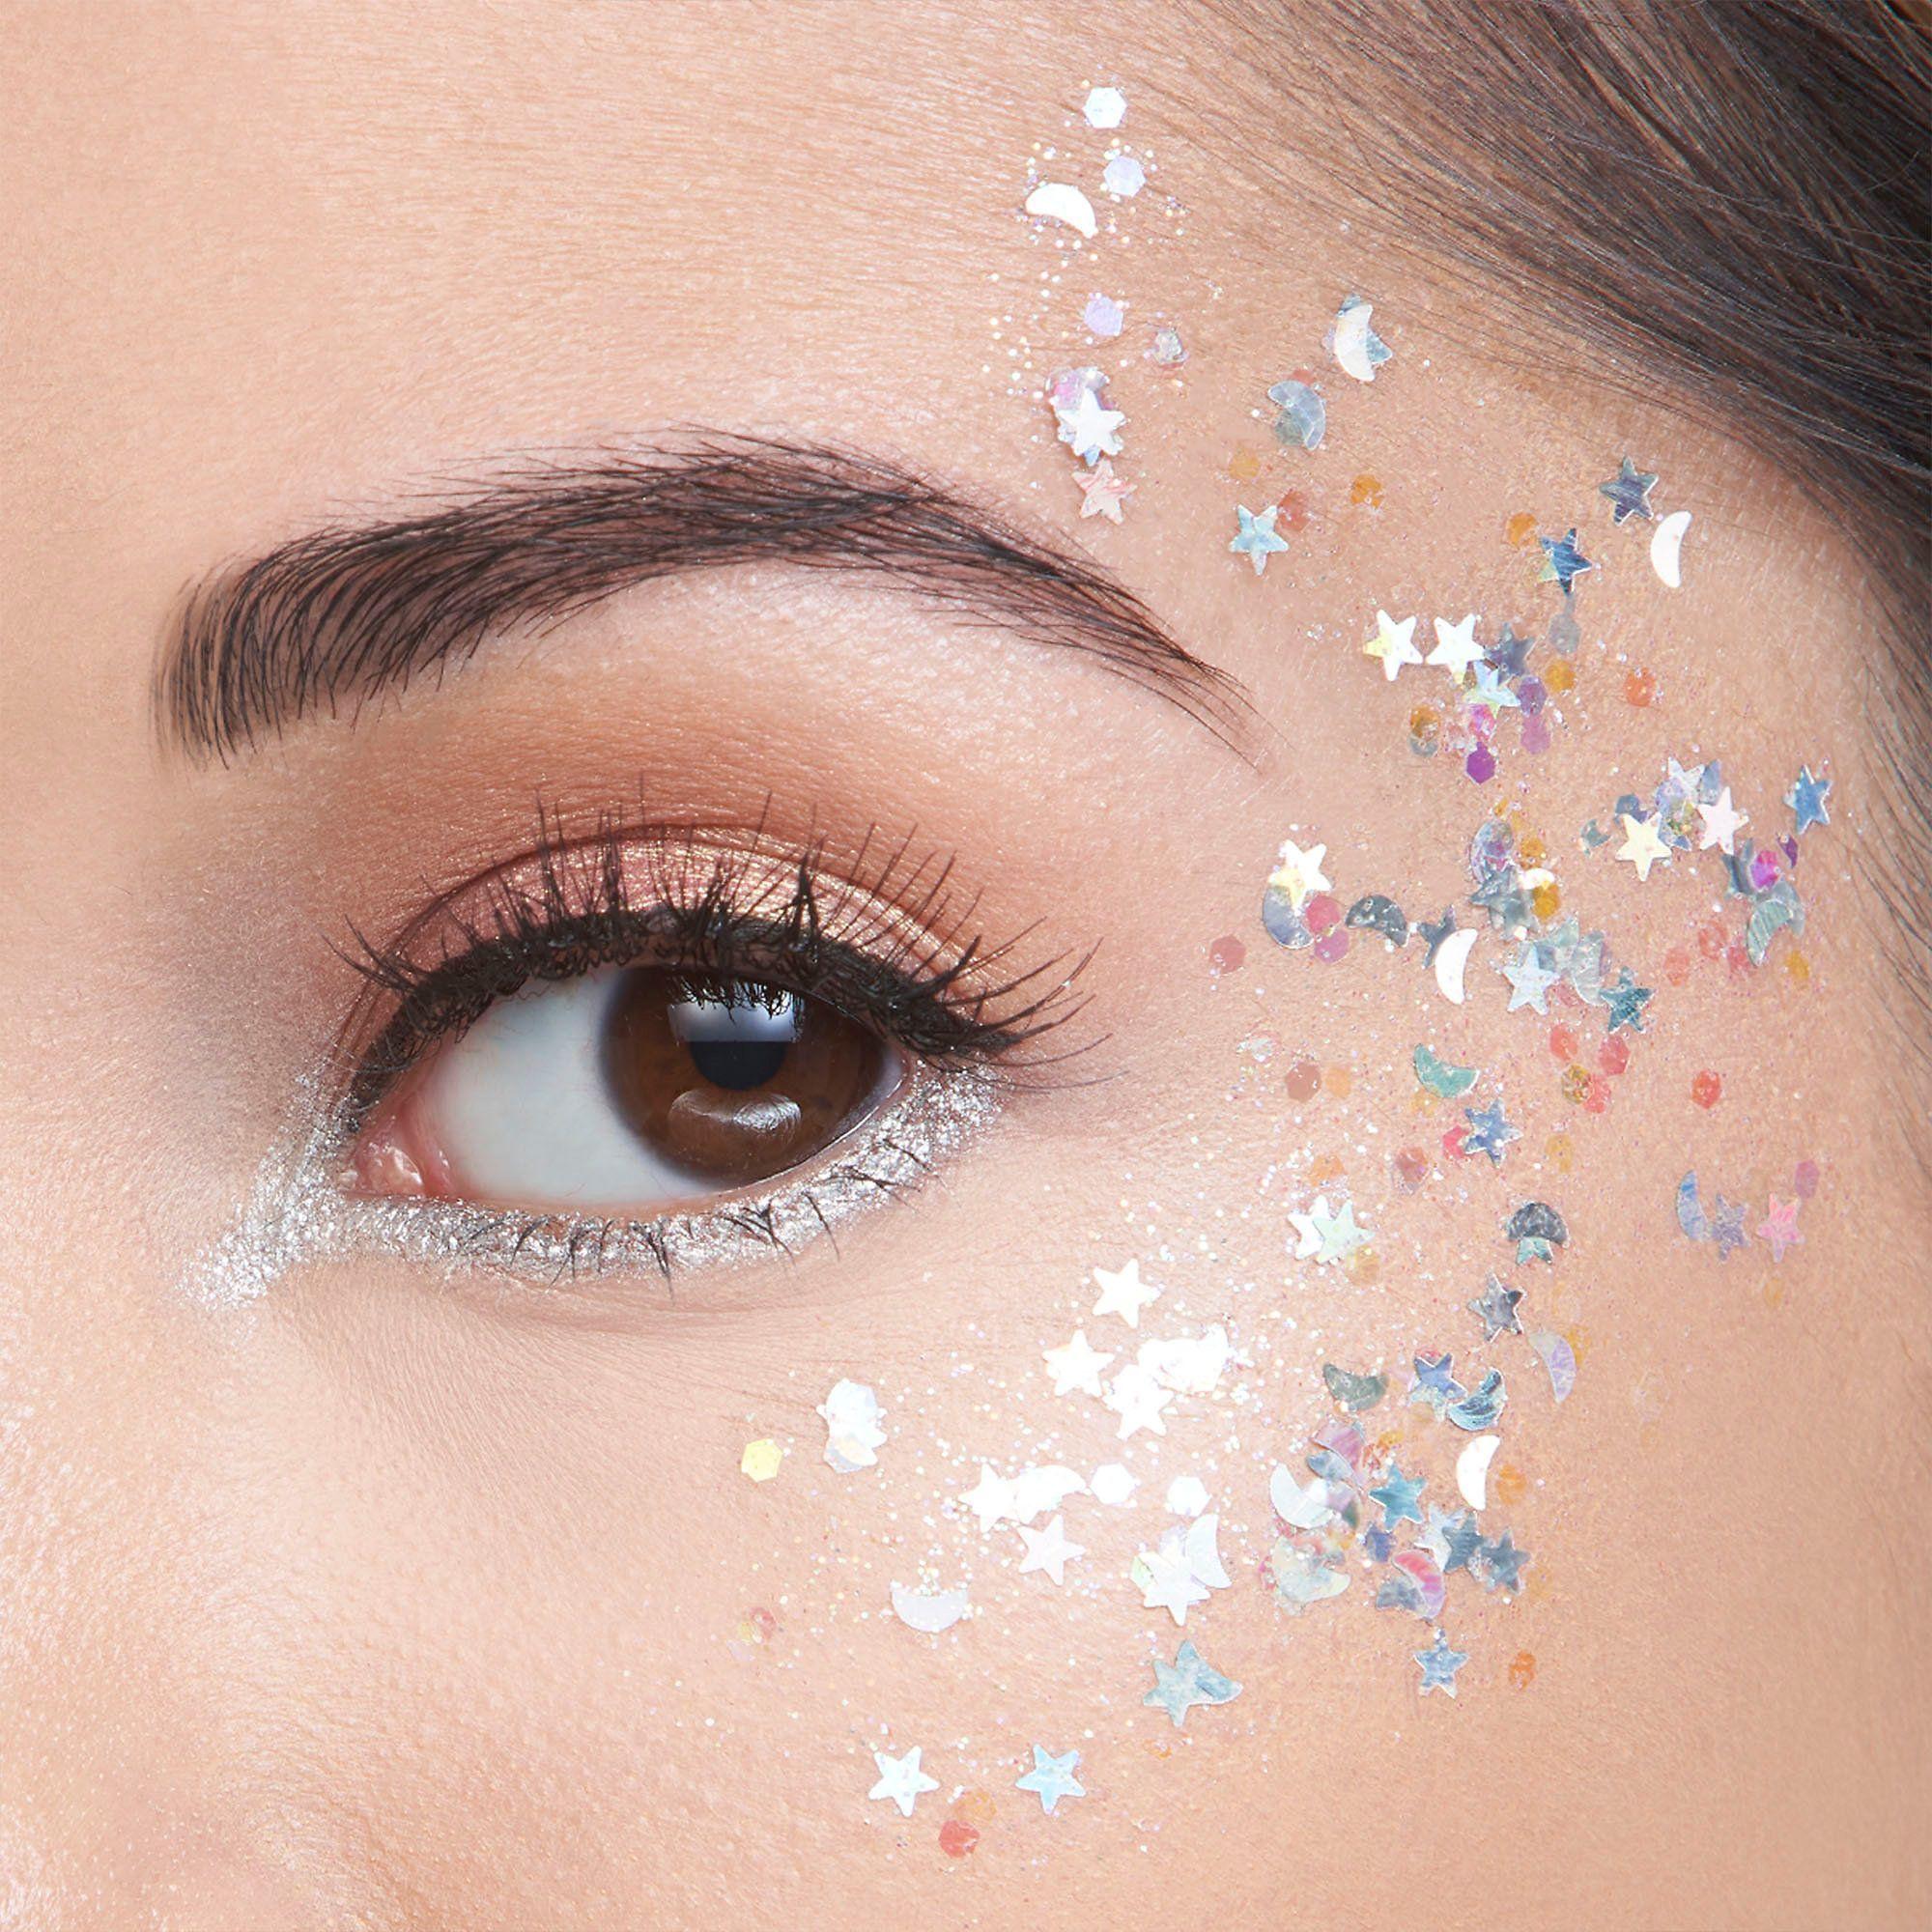 Stardust Glitter Makeup glittermakeup 3.99; The Stardust